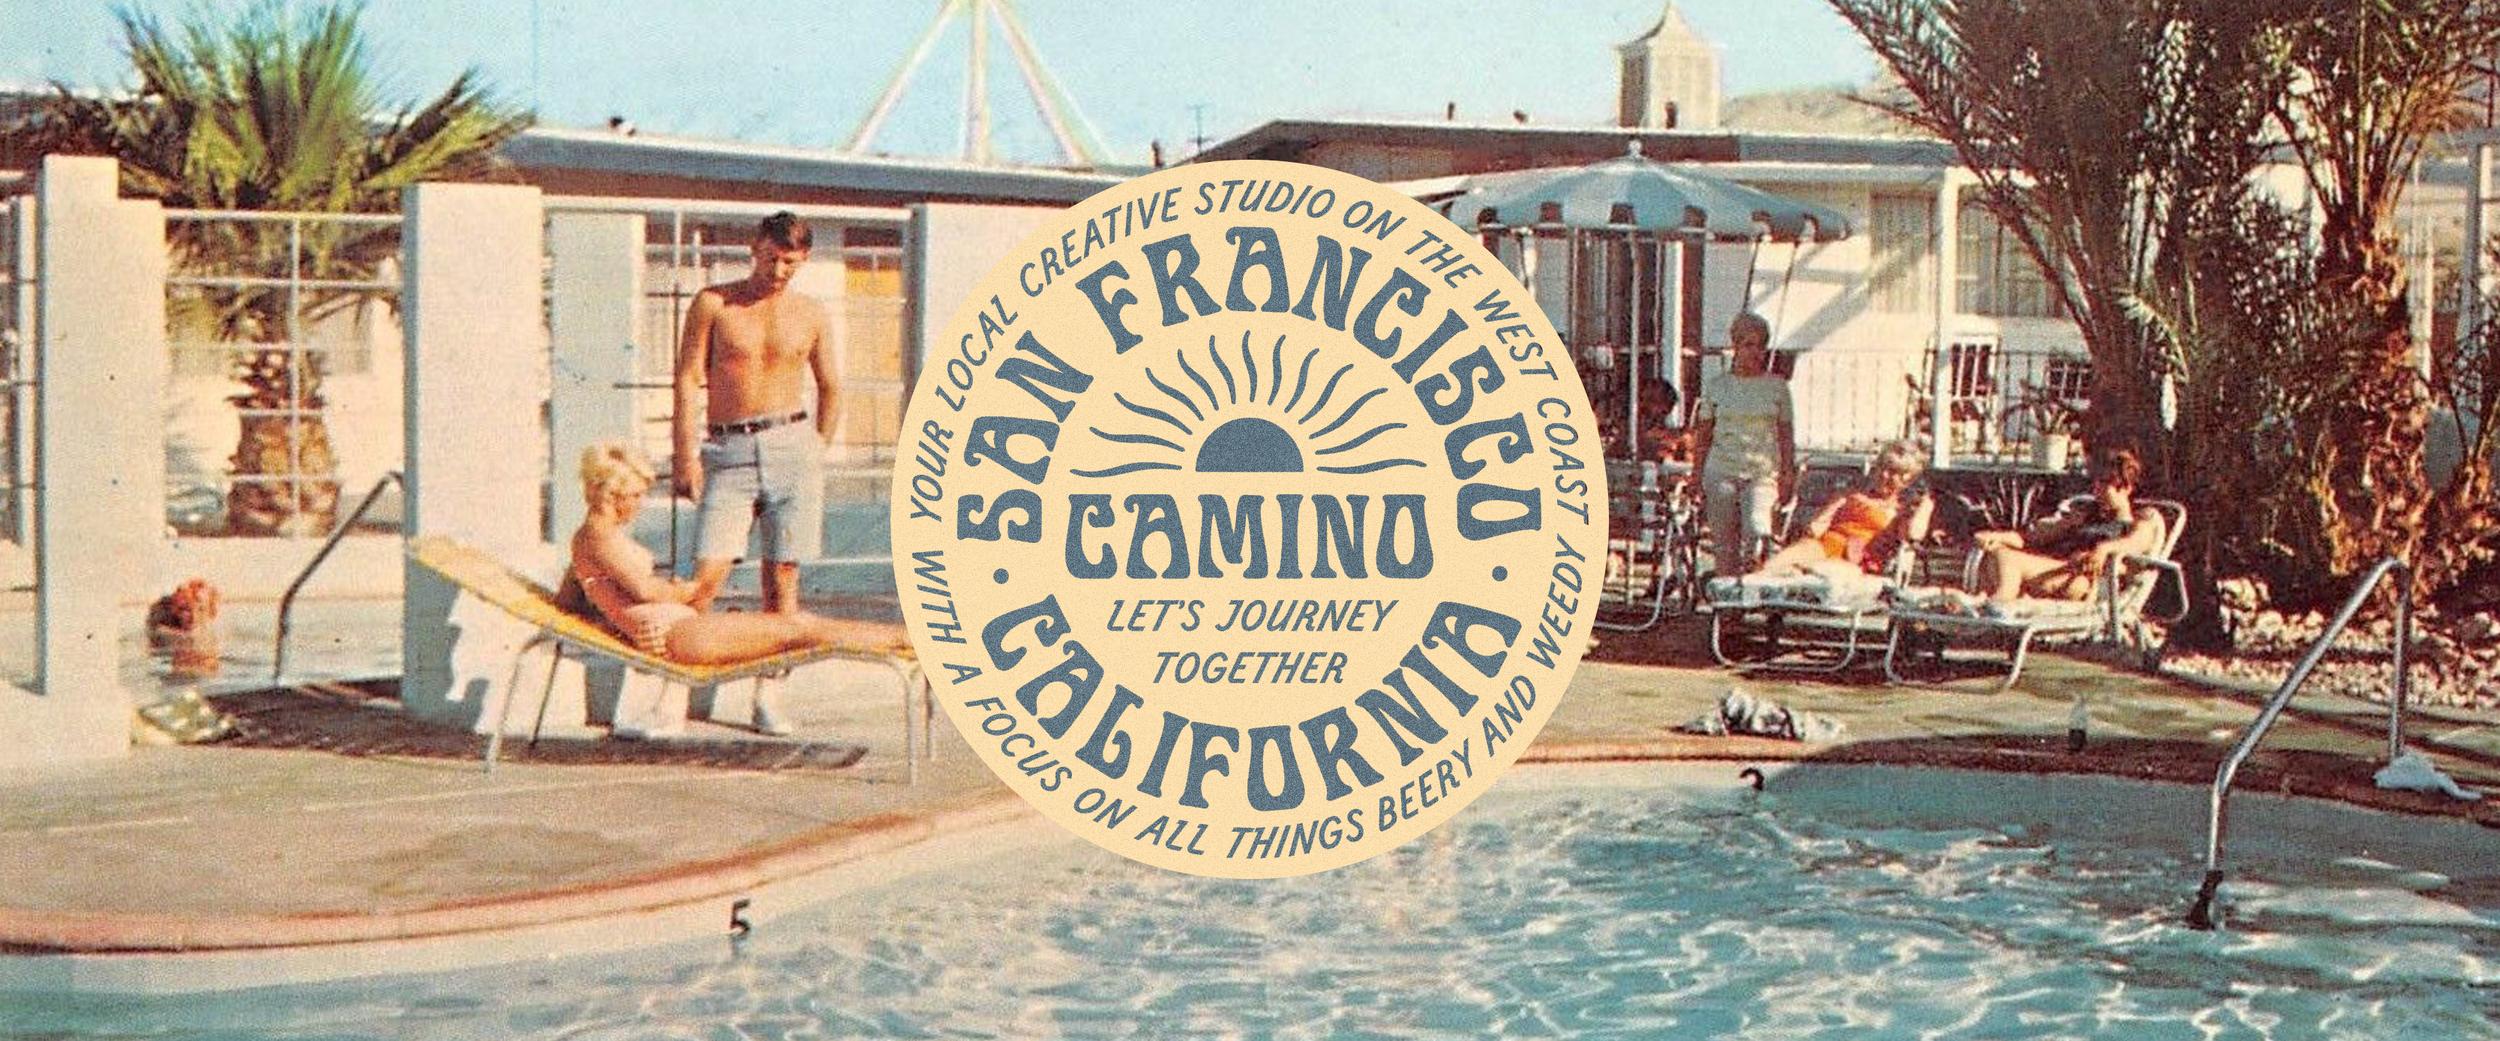 CaminoStudio_Homepage_Banner.png